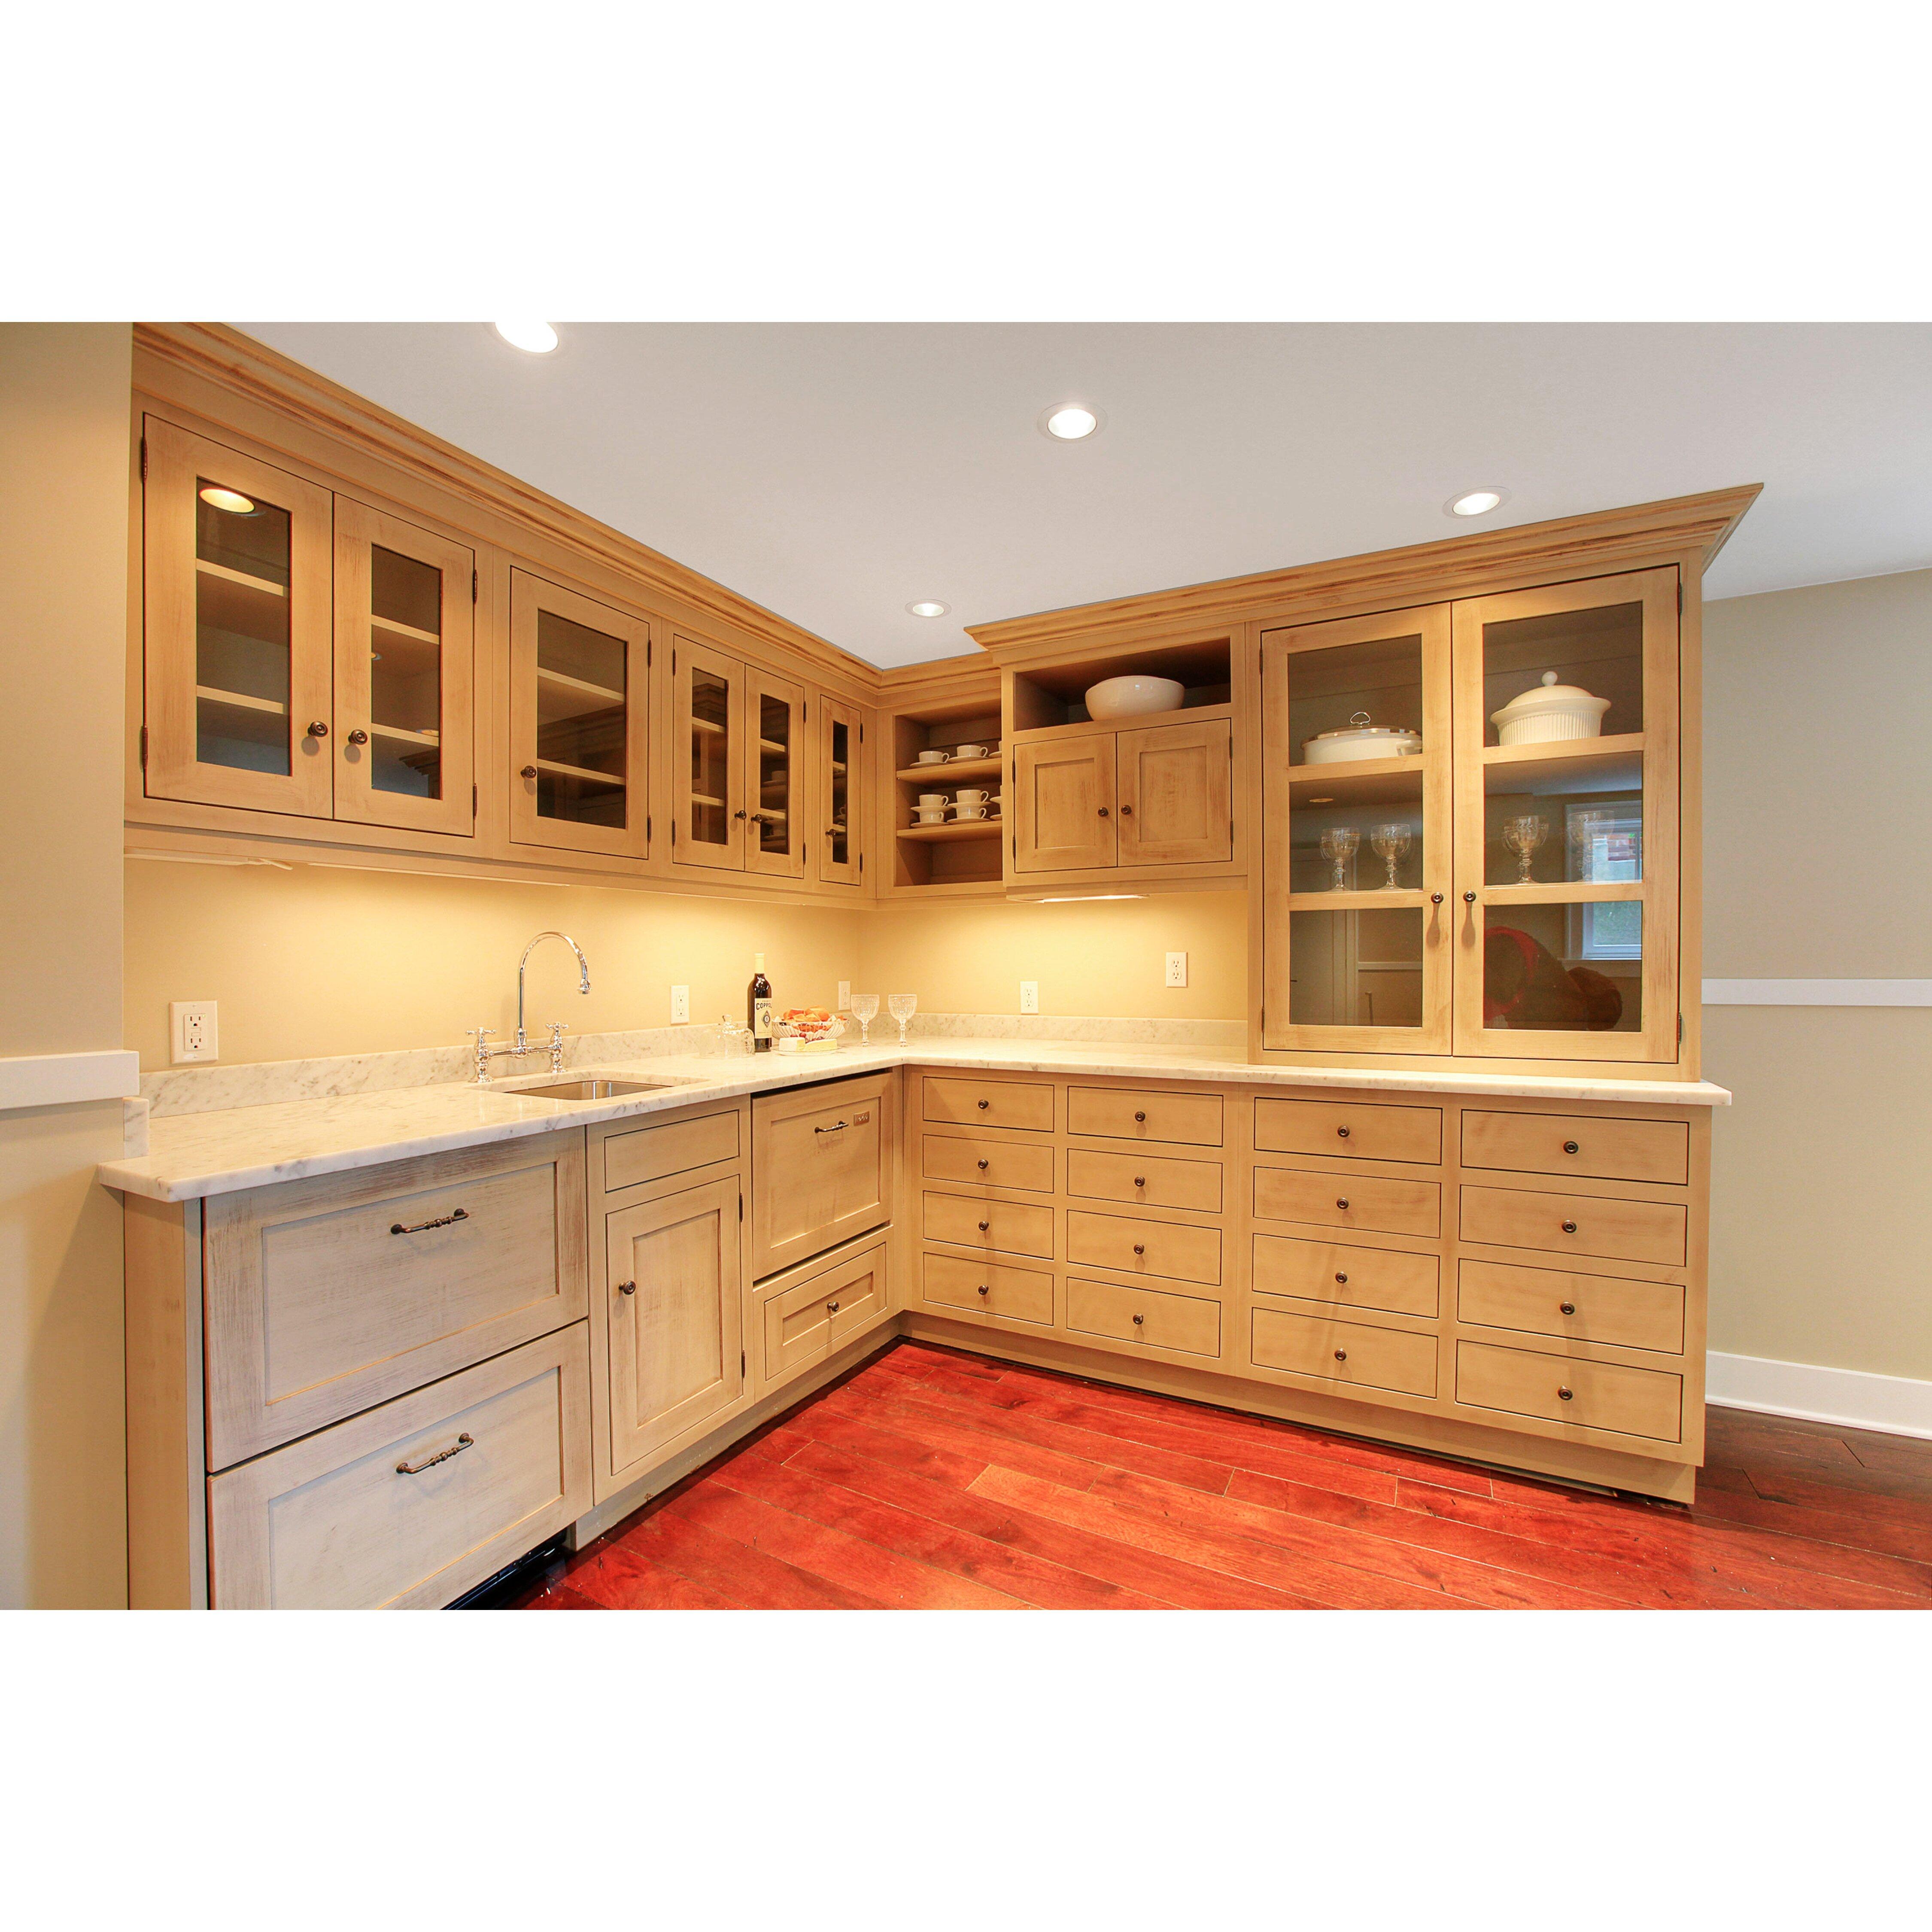 radionic hi tech orly 19 led under cabinet strip light reviews wayfair. Black Bedroom Furniture Sets. Home Design Ideas